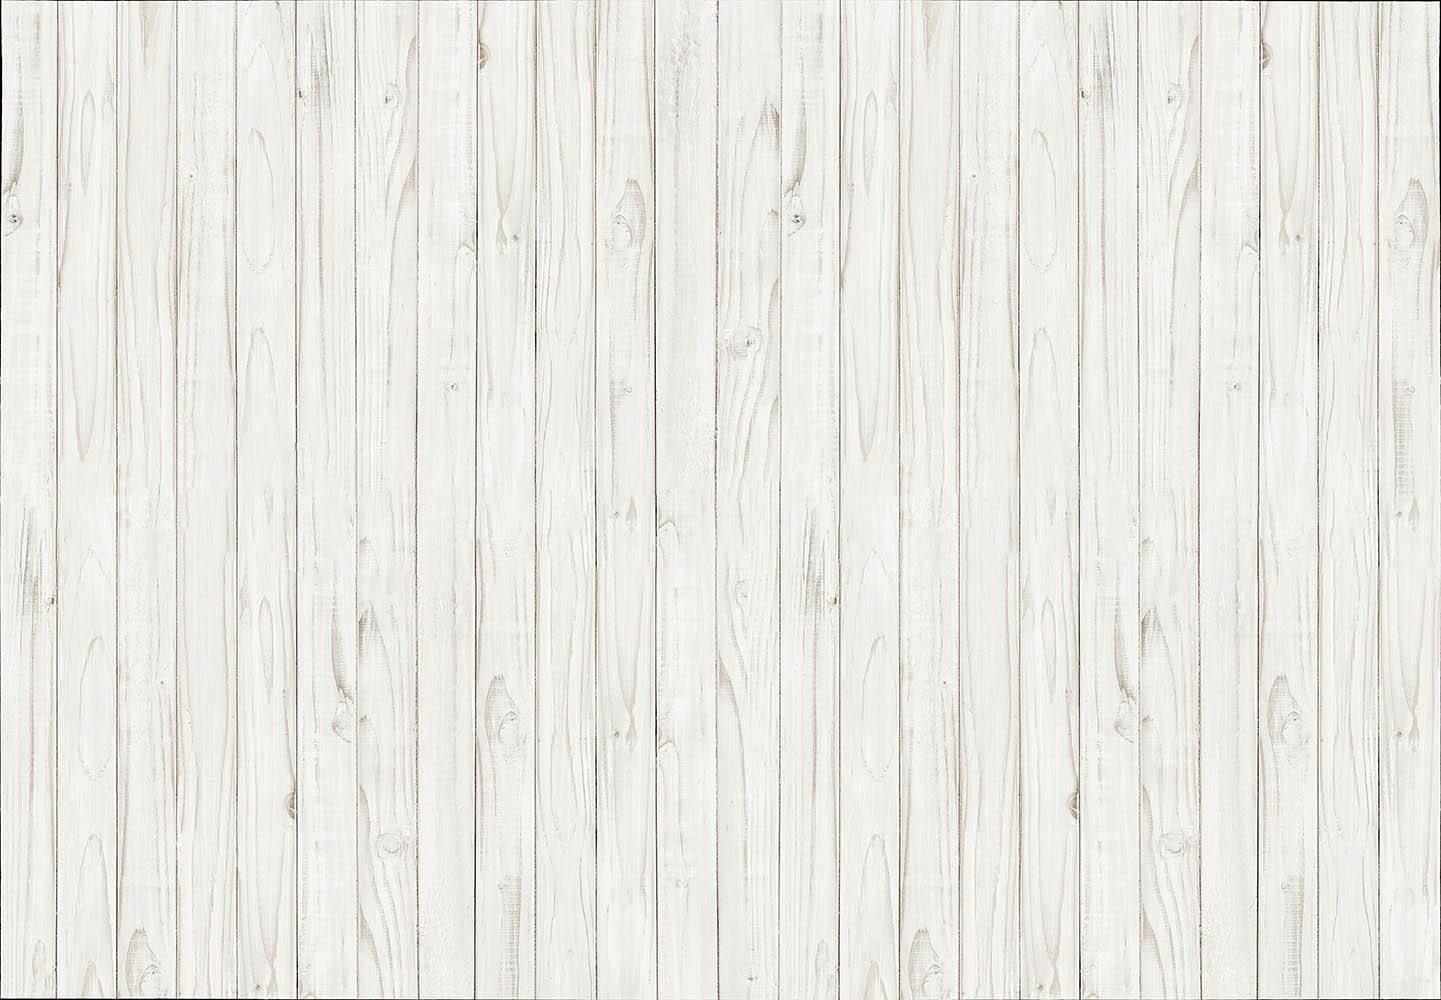 Fototapete »Holzwand« 366/254 cm